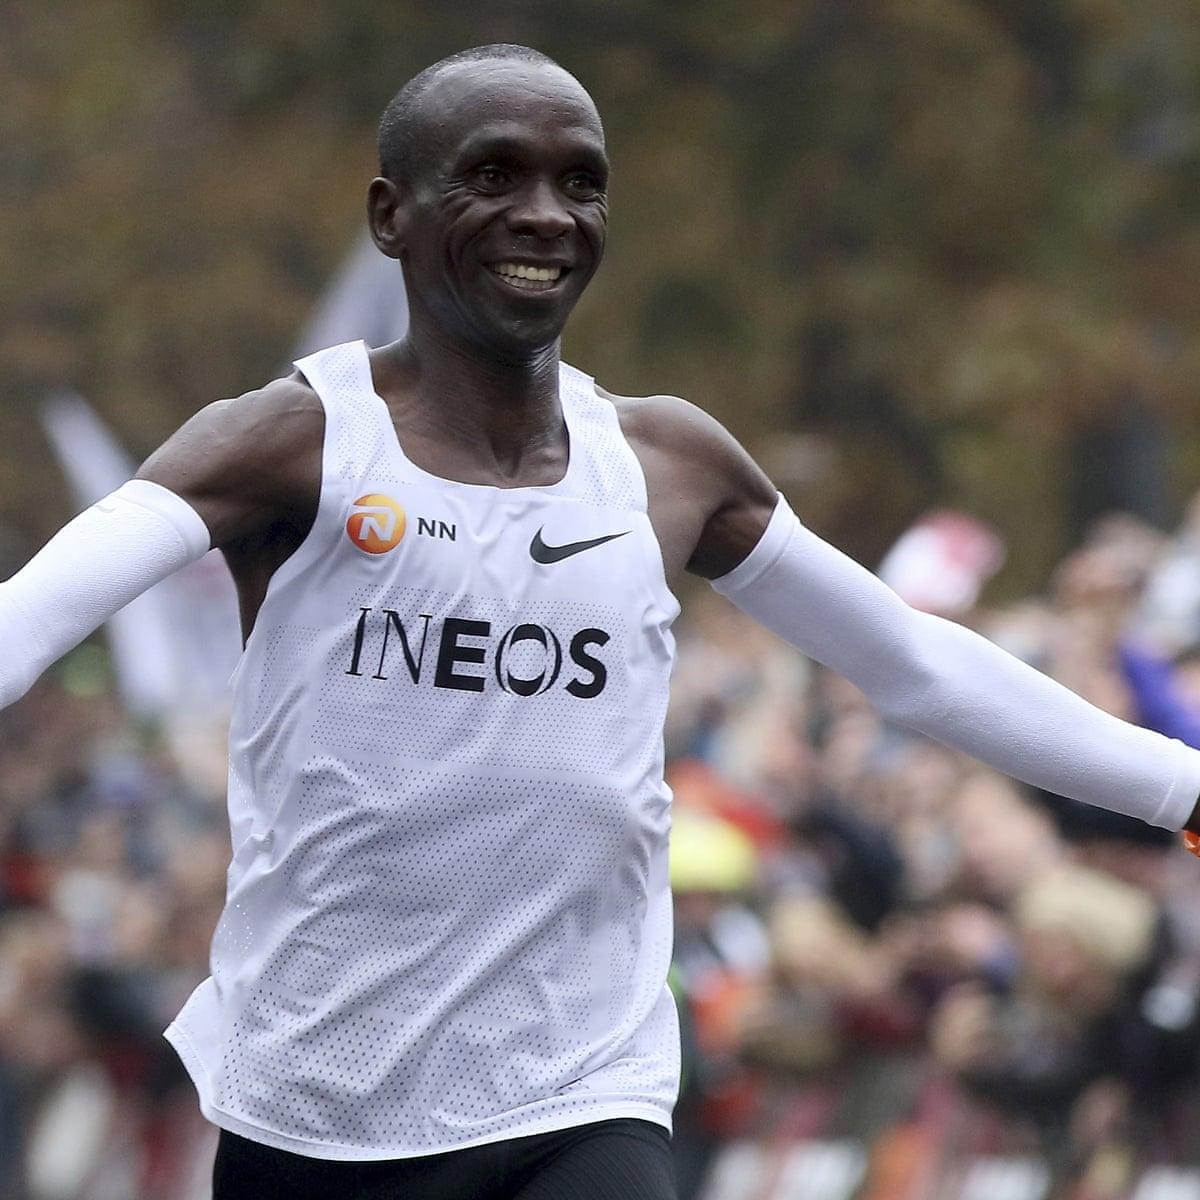 Kenyan Kipchoge: Greatest-ever men's marathon runner - Sports Leo